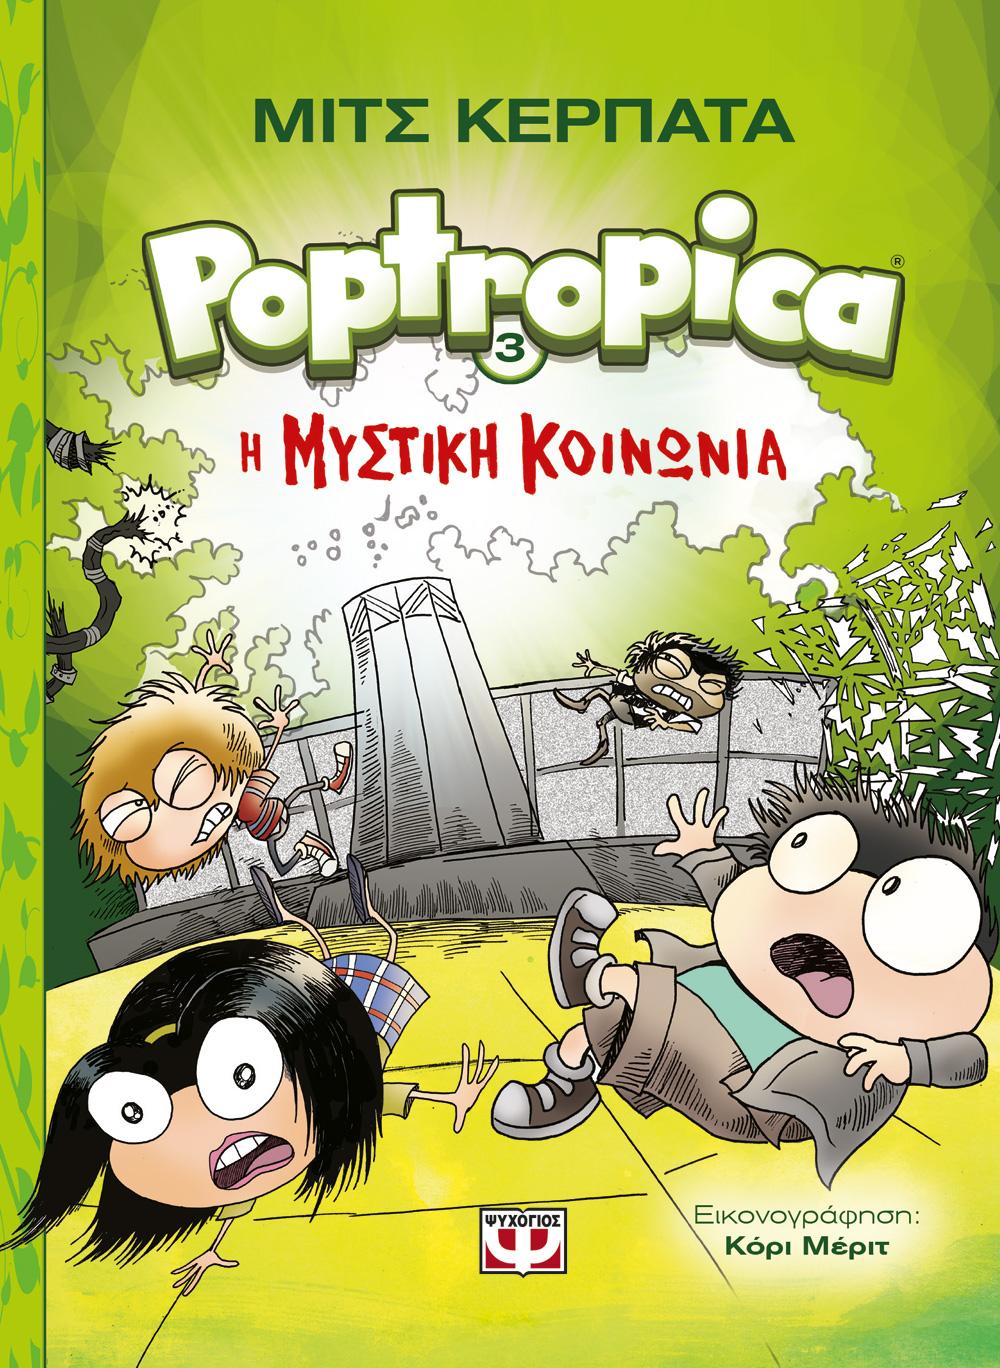 POPTROPICA 3 - THE SECRET SOCIETY - MITCH KRPATA